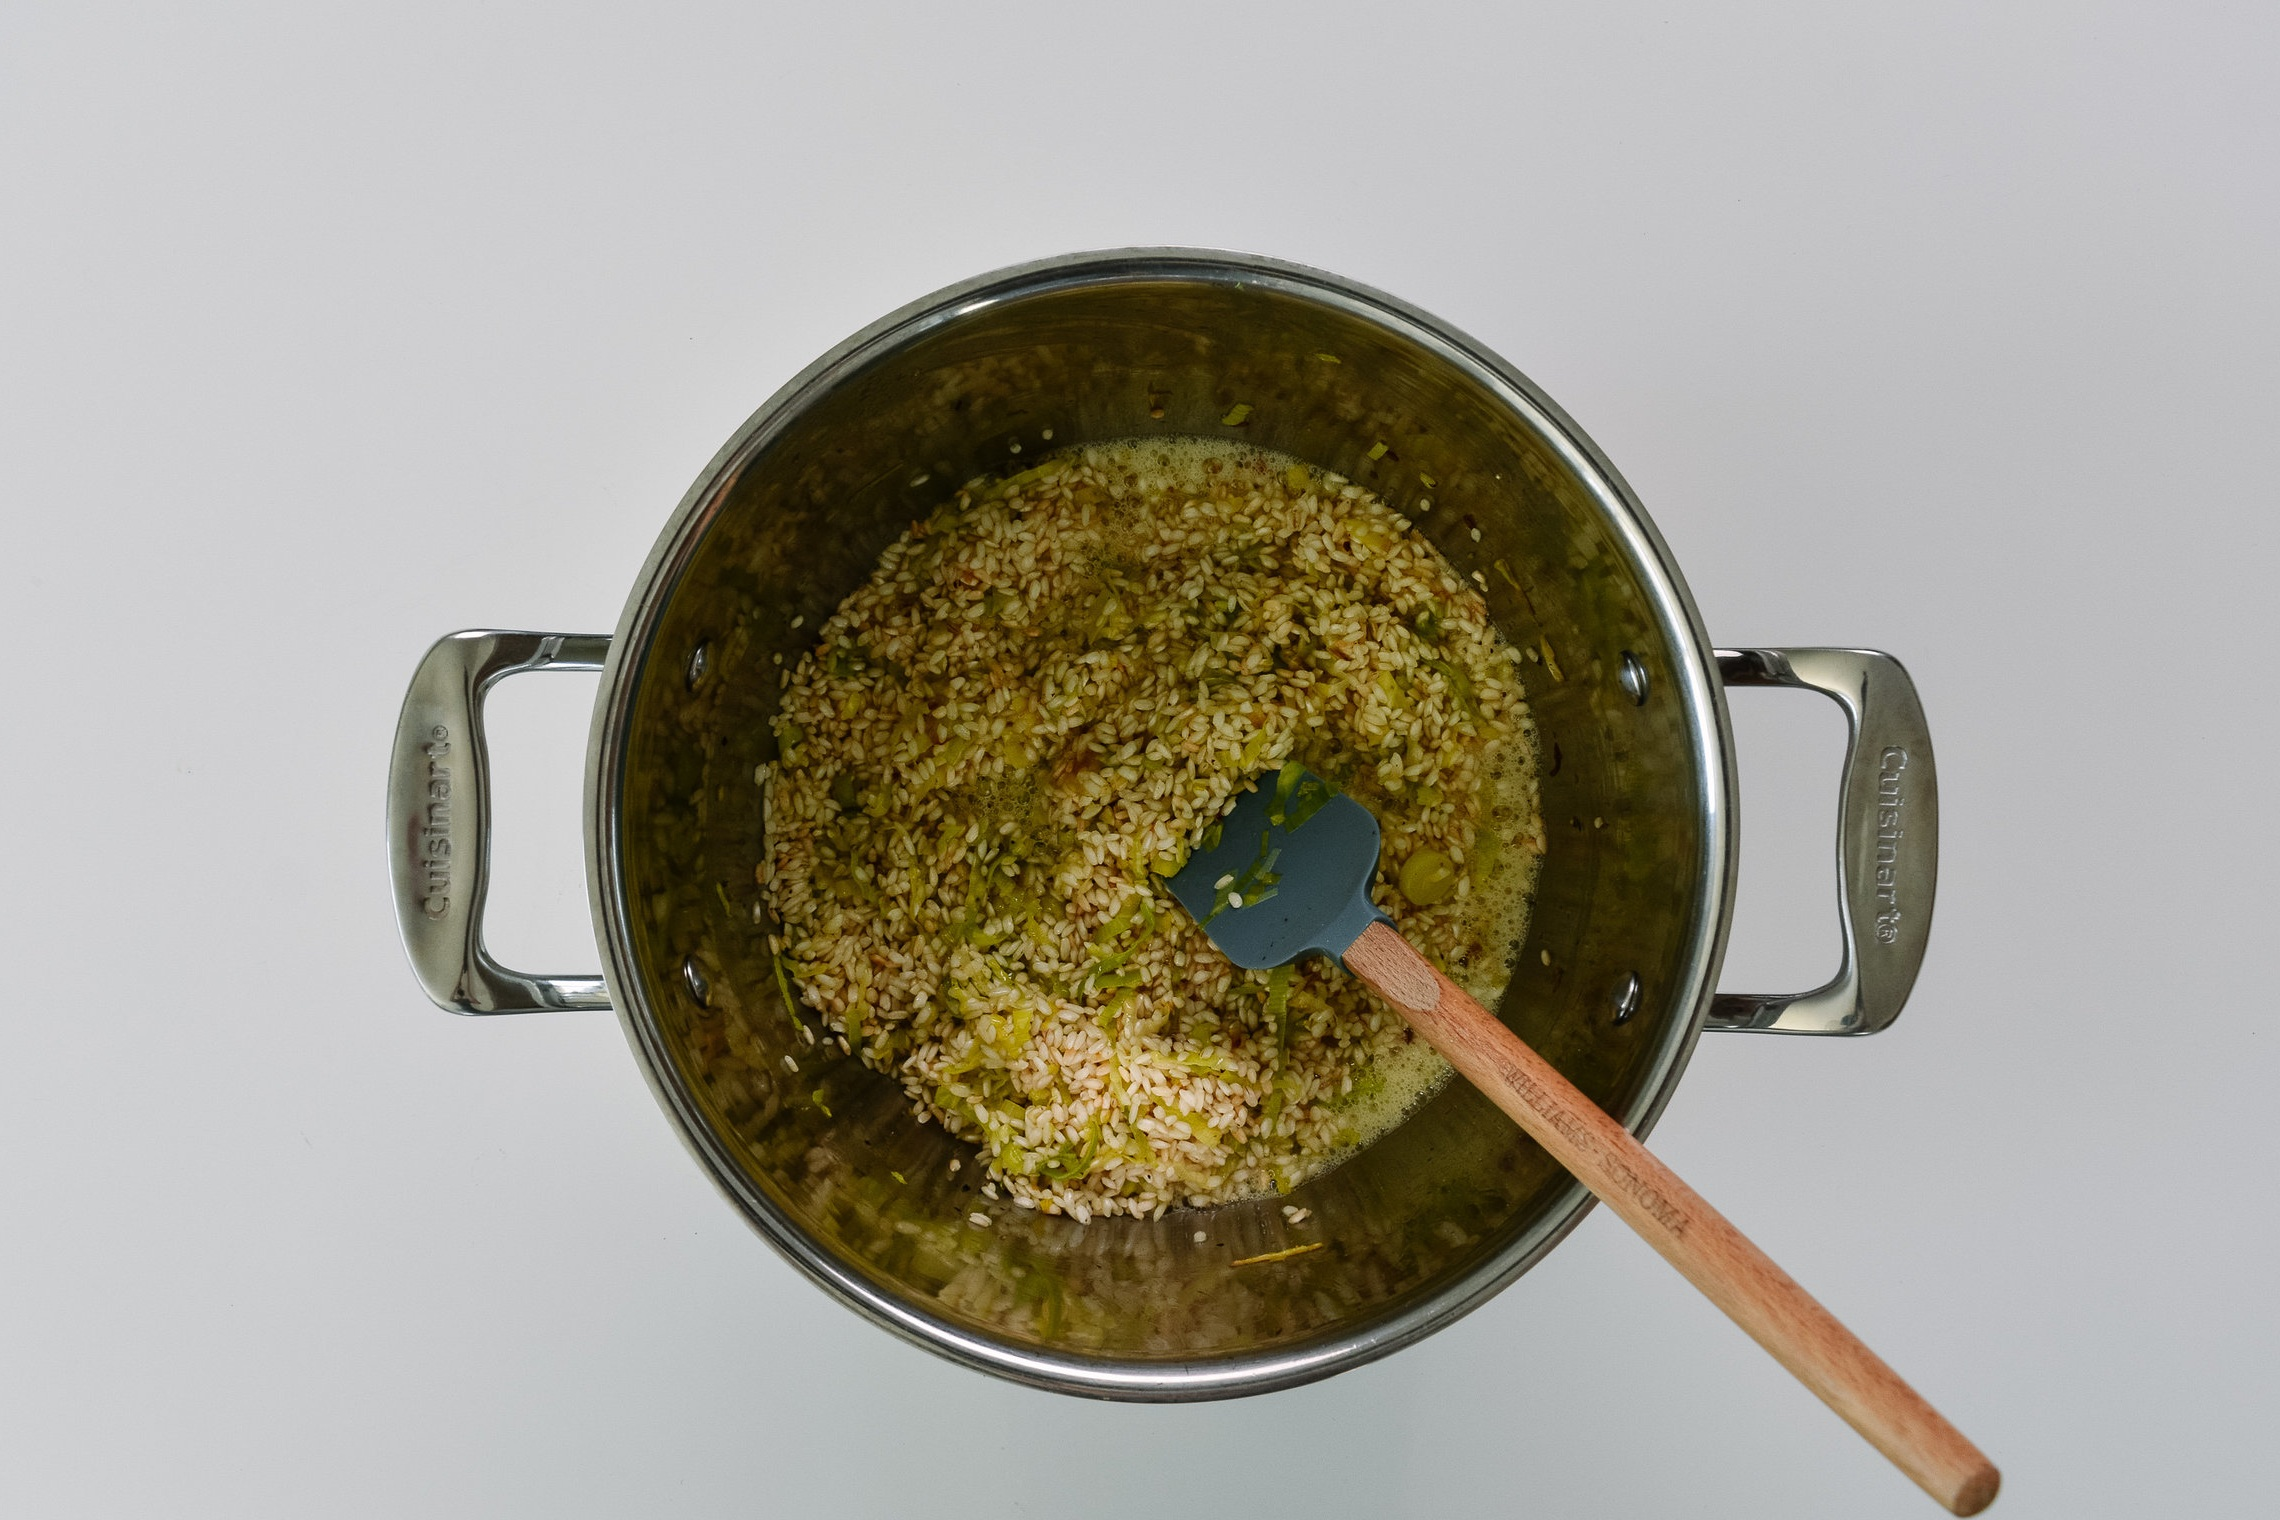 Leek and shiitake mushroom risotto